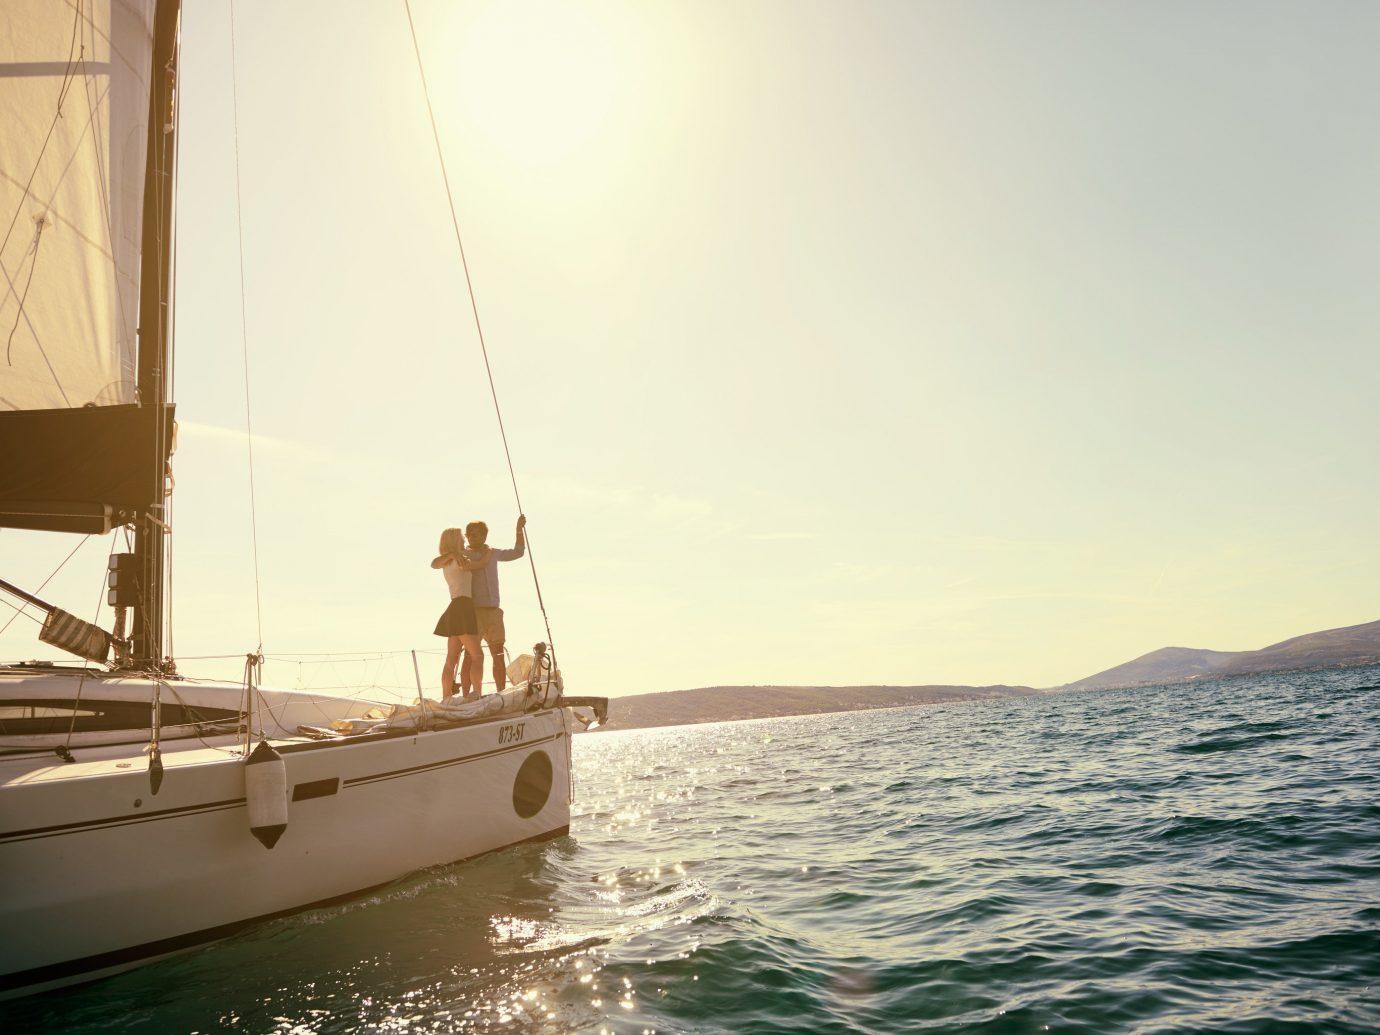 Travel Tips water sky watercraft outdoor Boat transport sail sailboat sailing vessel vehicle sailing Sea sports ship sailing ship yacht mast windsports day